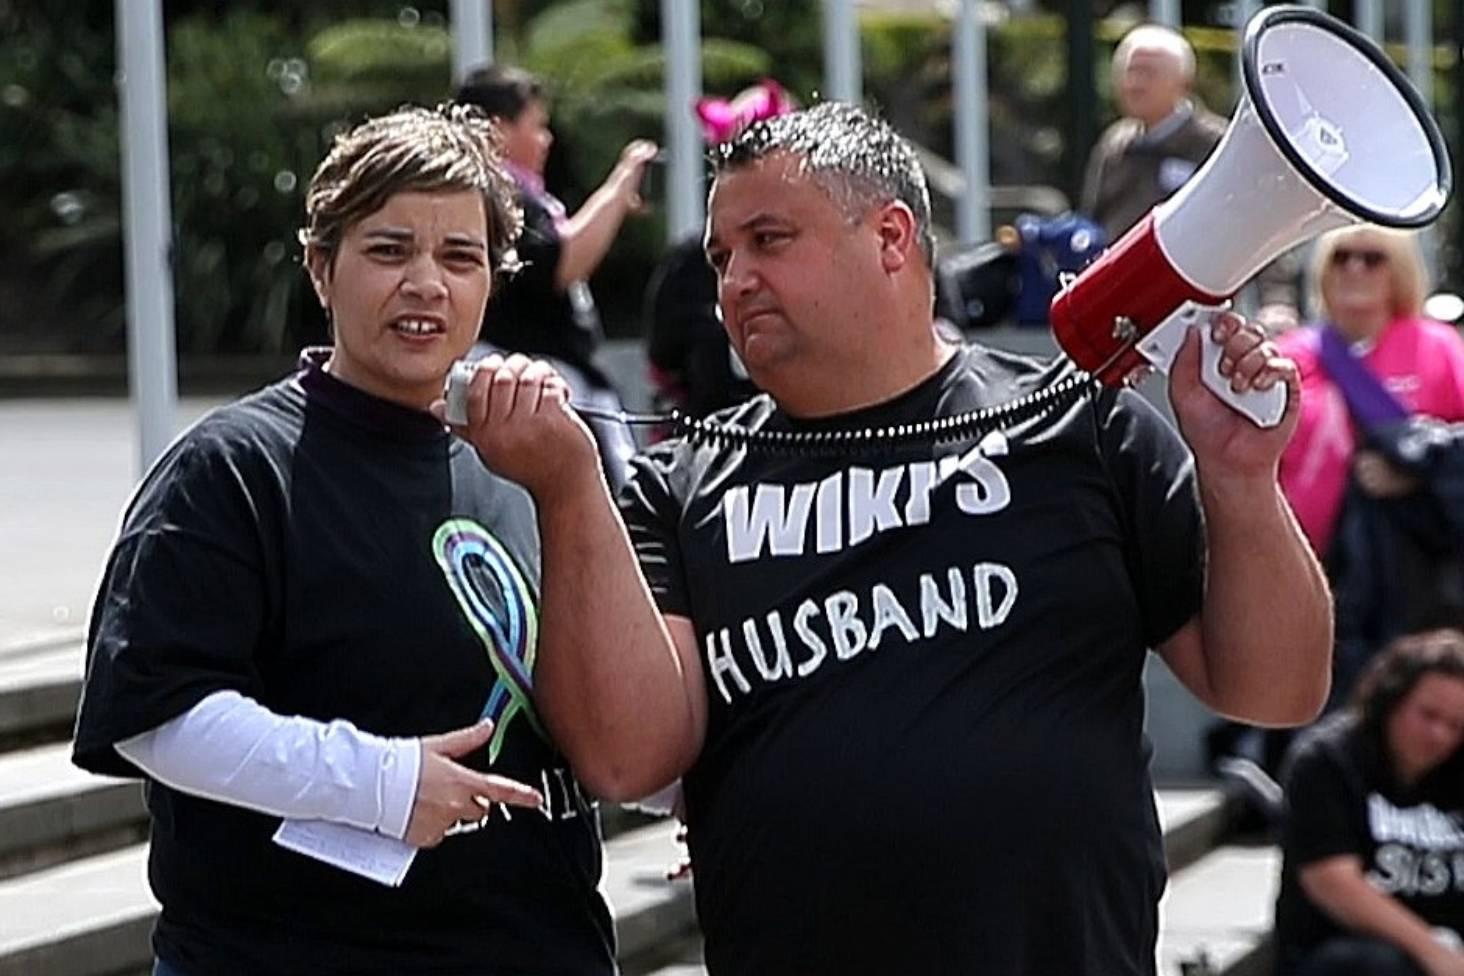 Big Johnson T Shirts Wiki - Nils Stucki Kieferorthopäde